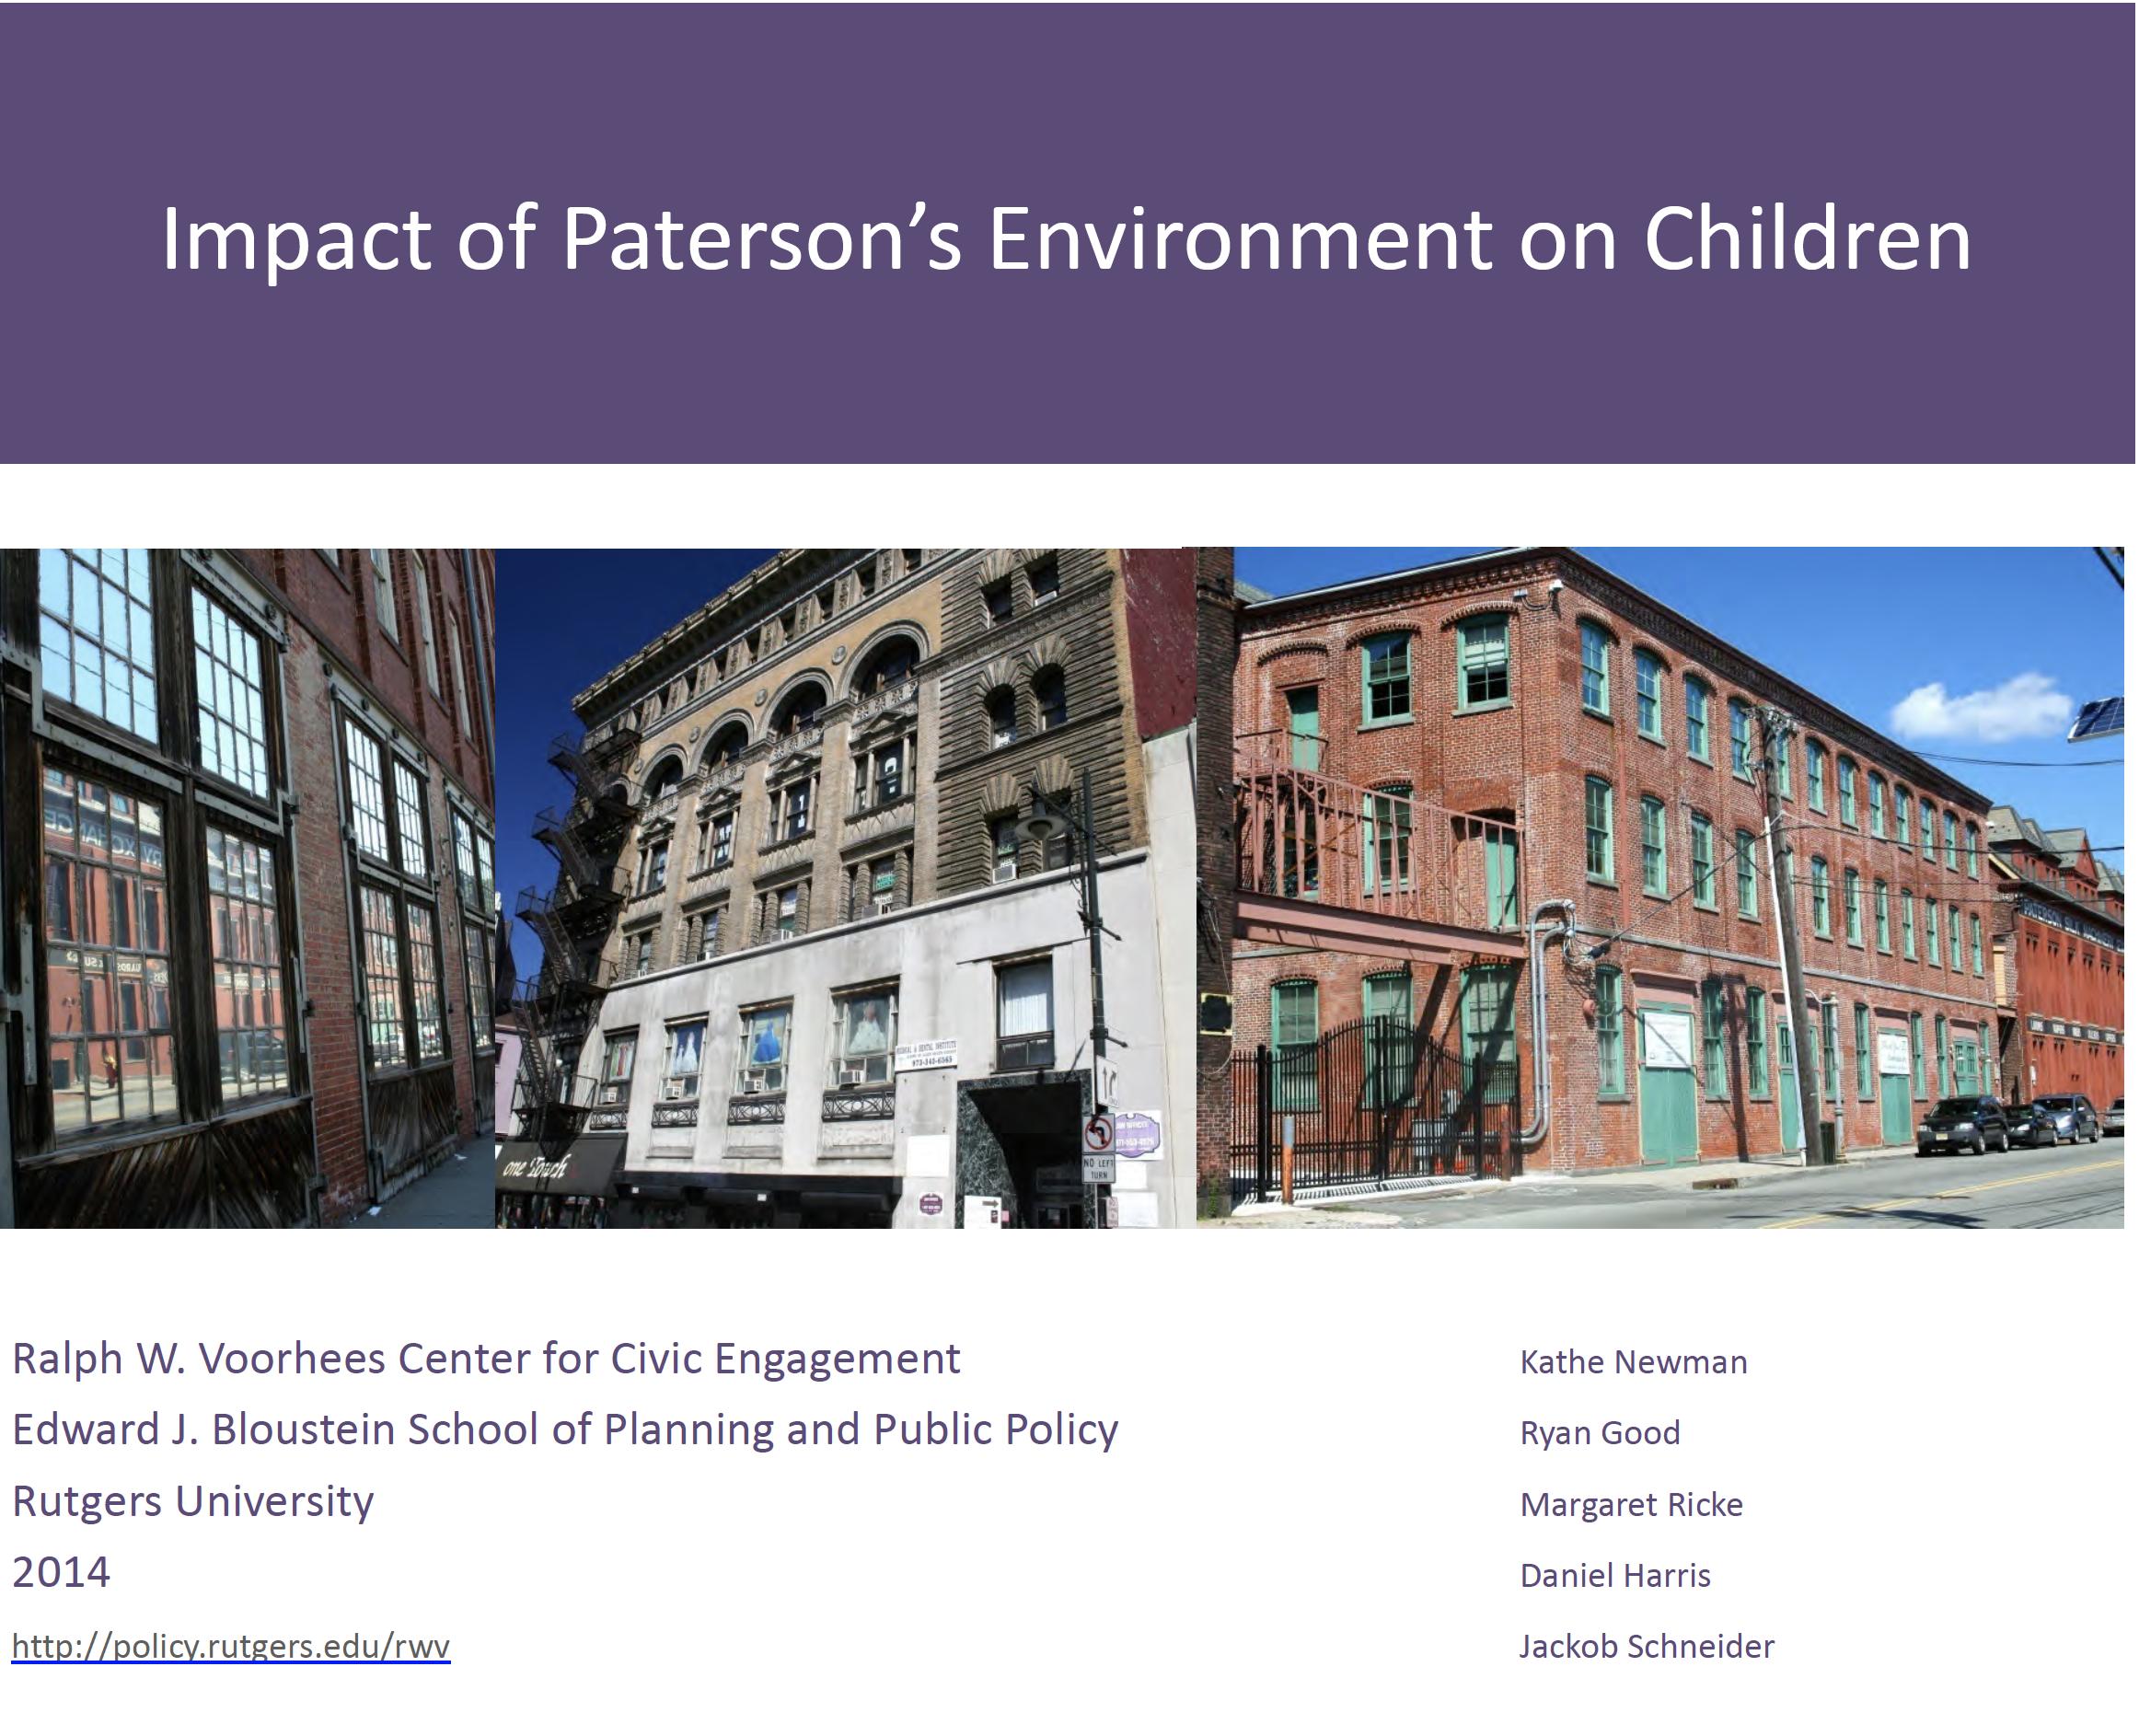 paterson community development Voorhees civic engagement Bloustein